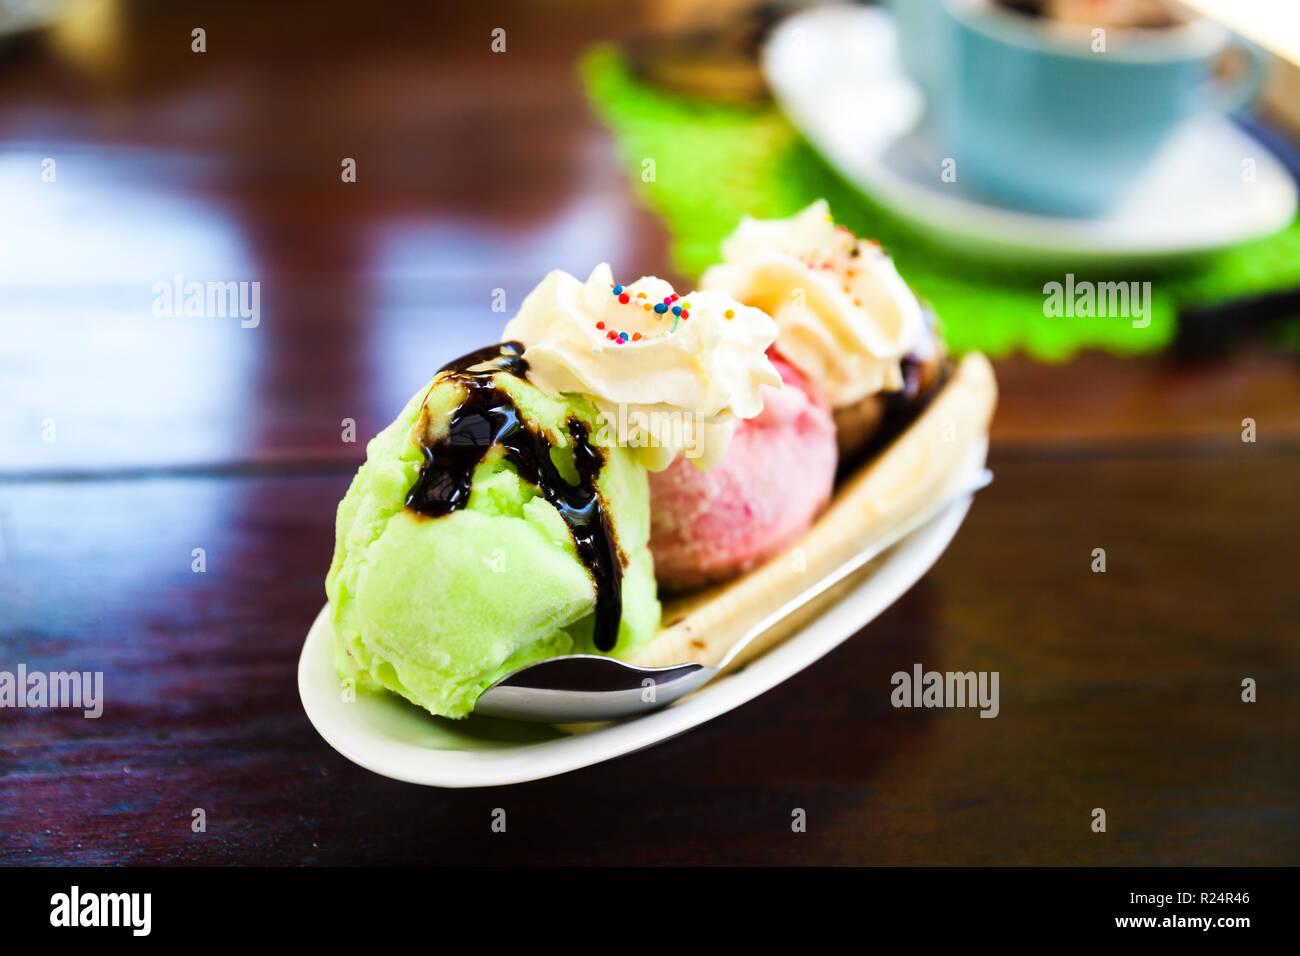 Fresh yummy nature ice creamy on beautiful blurred background - Stock Image